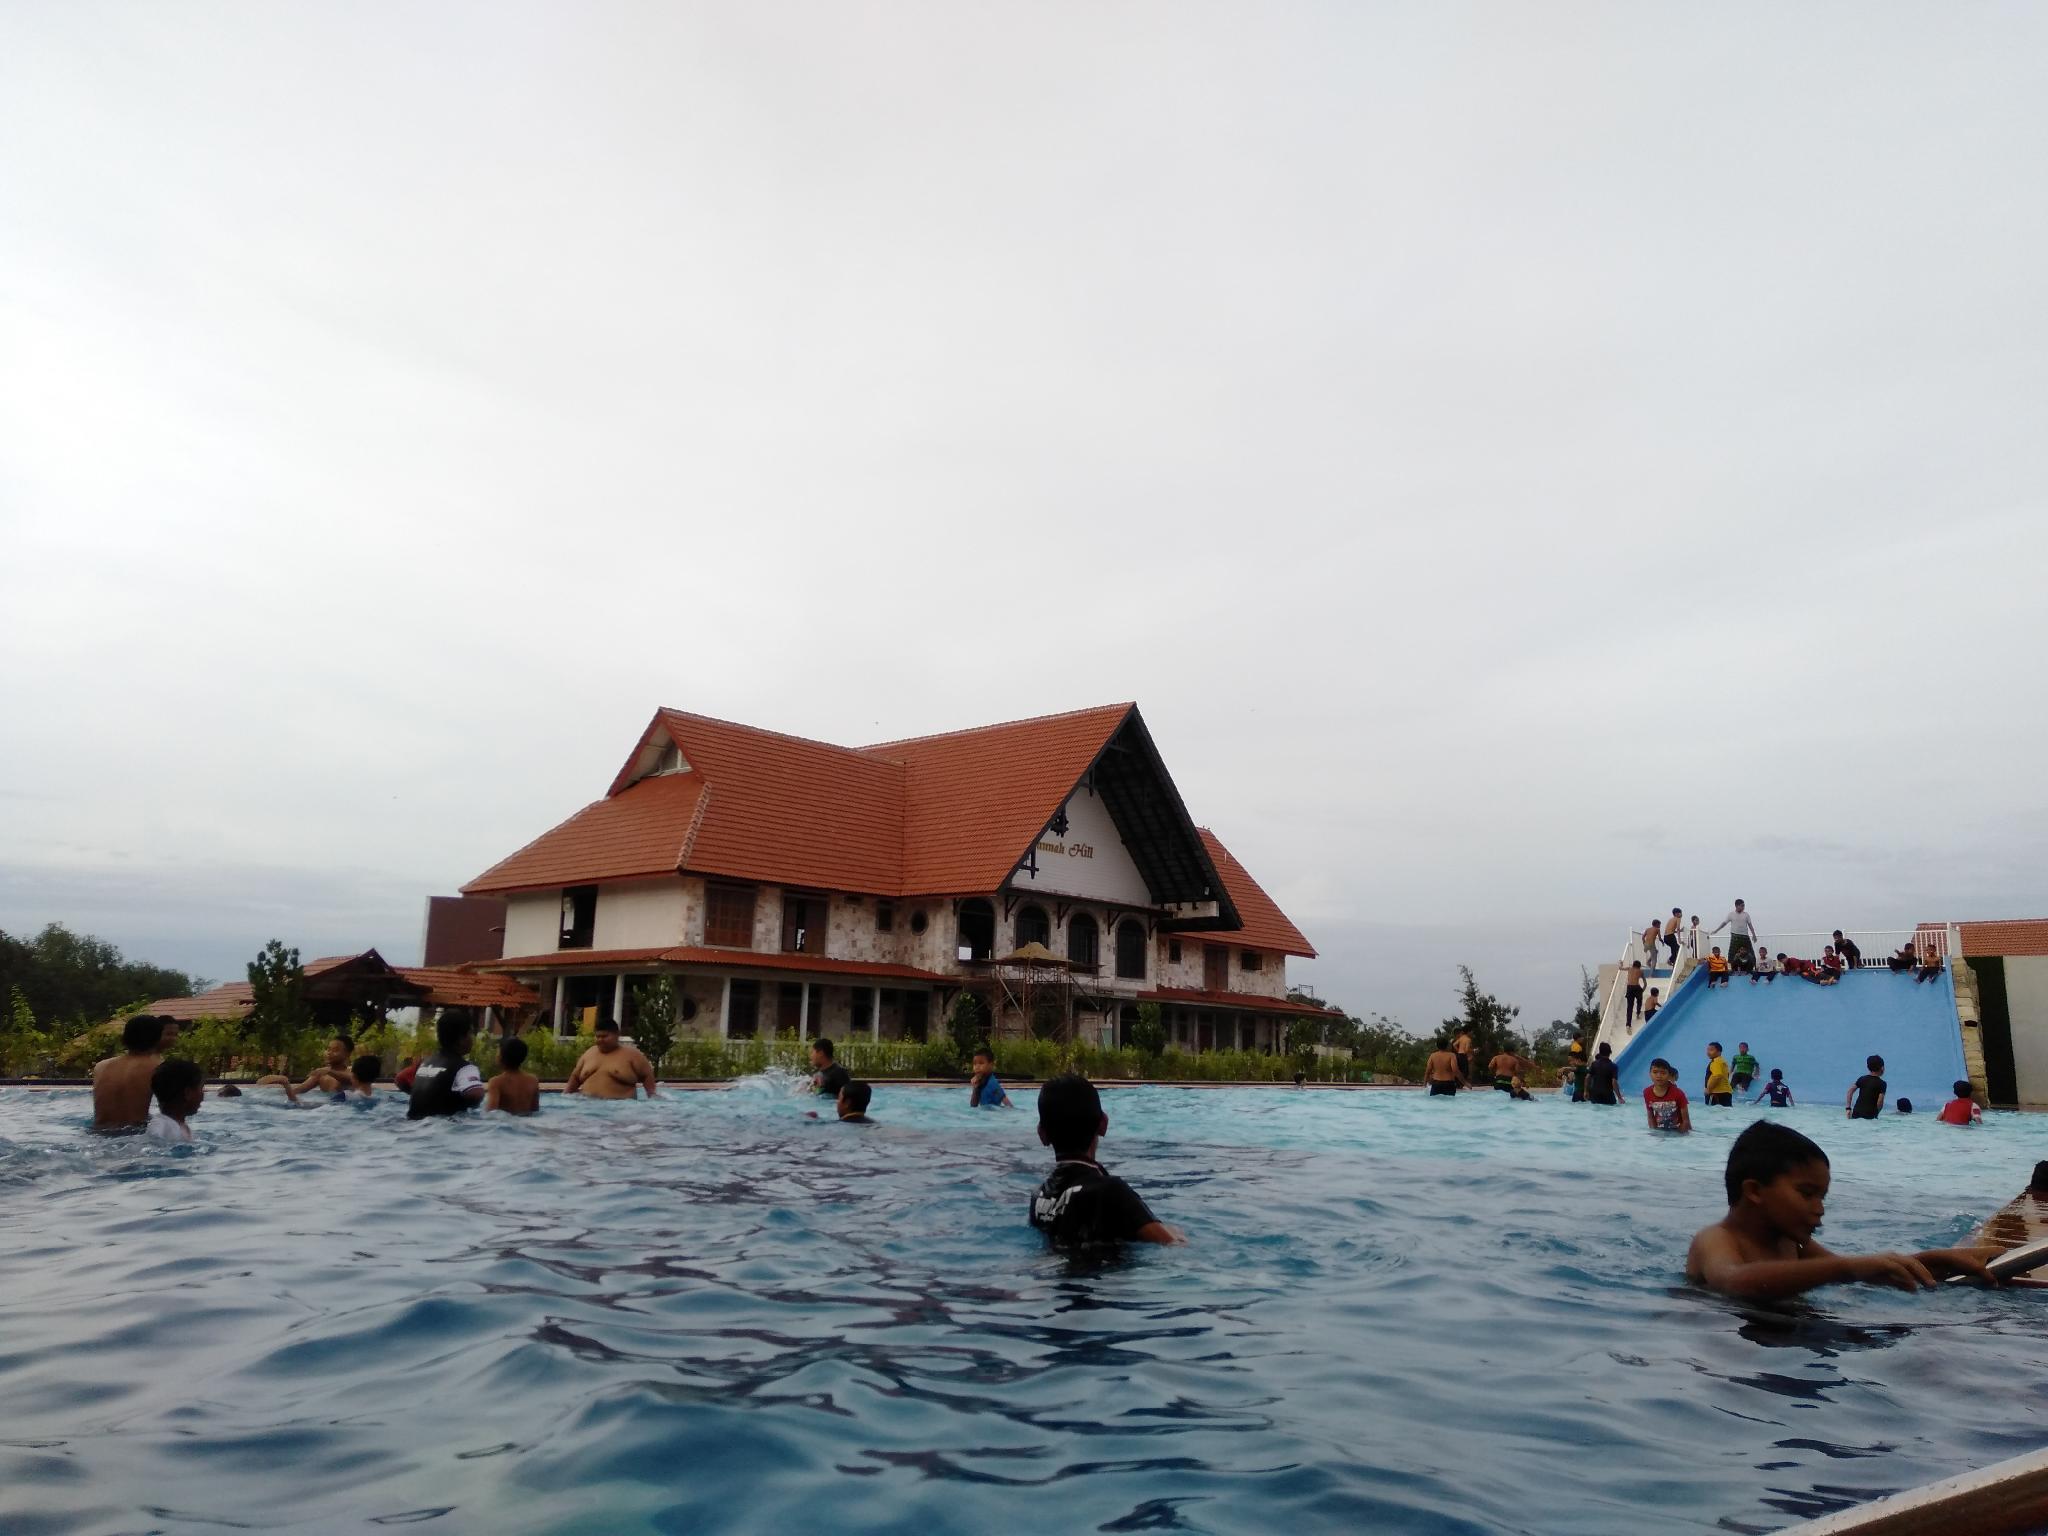 Savanna Hill Resort